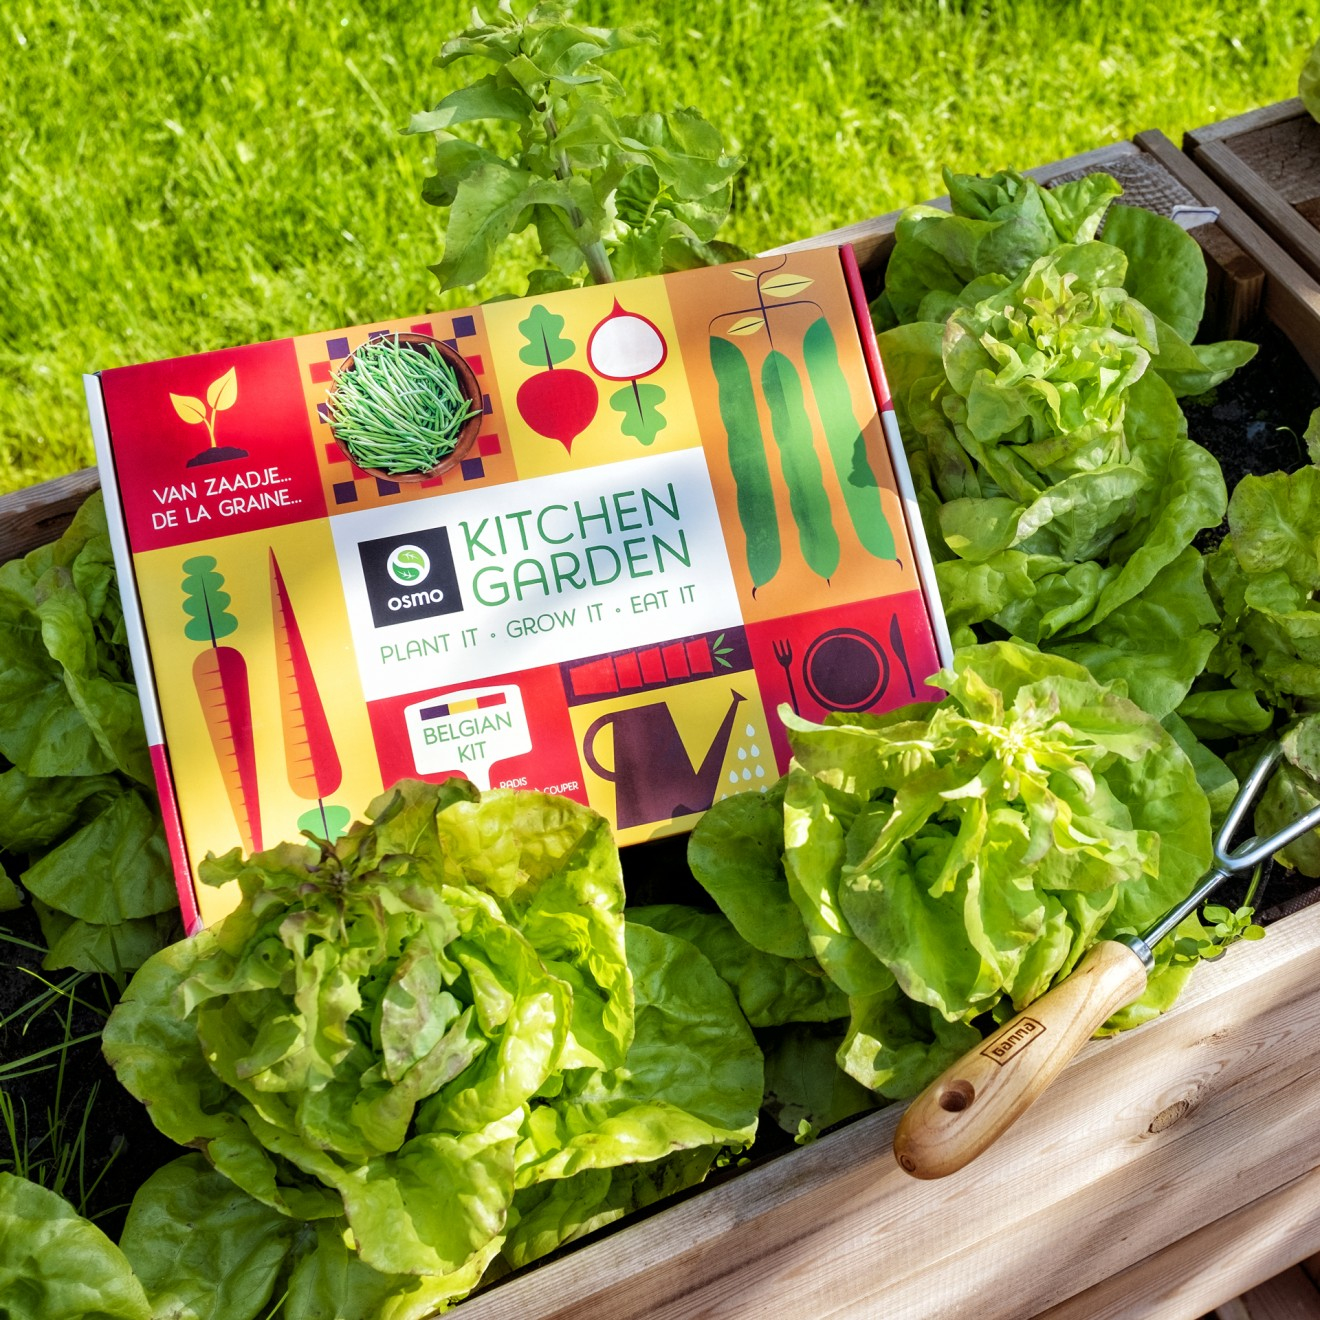 Quatre Mains package design - packaging, gardening, grow